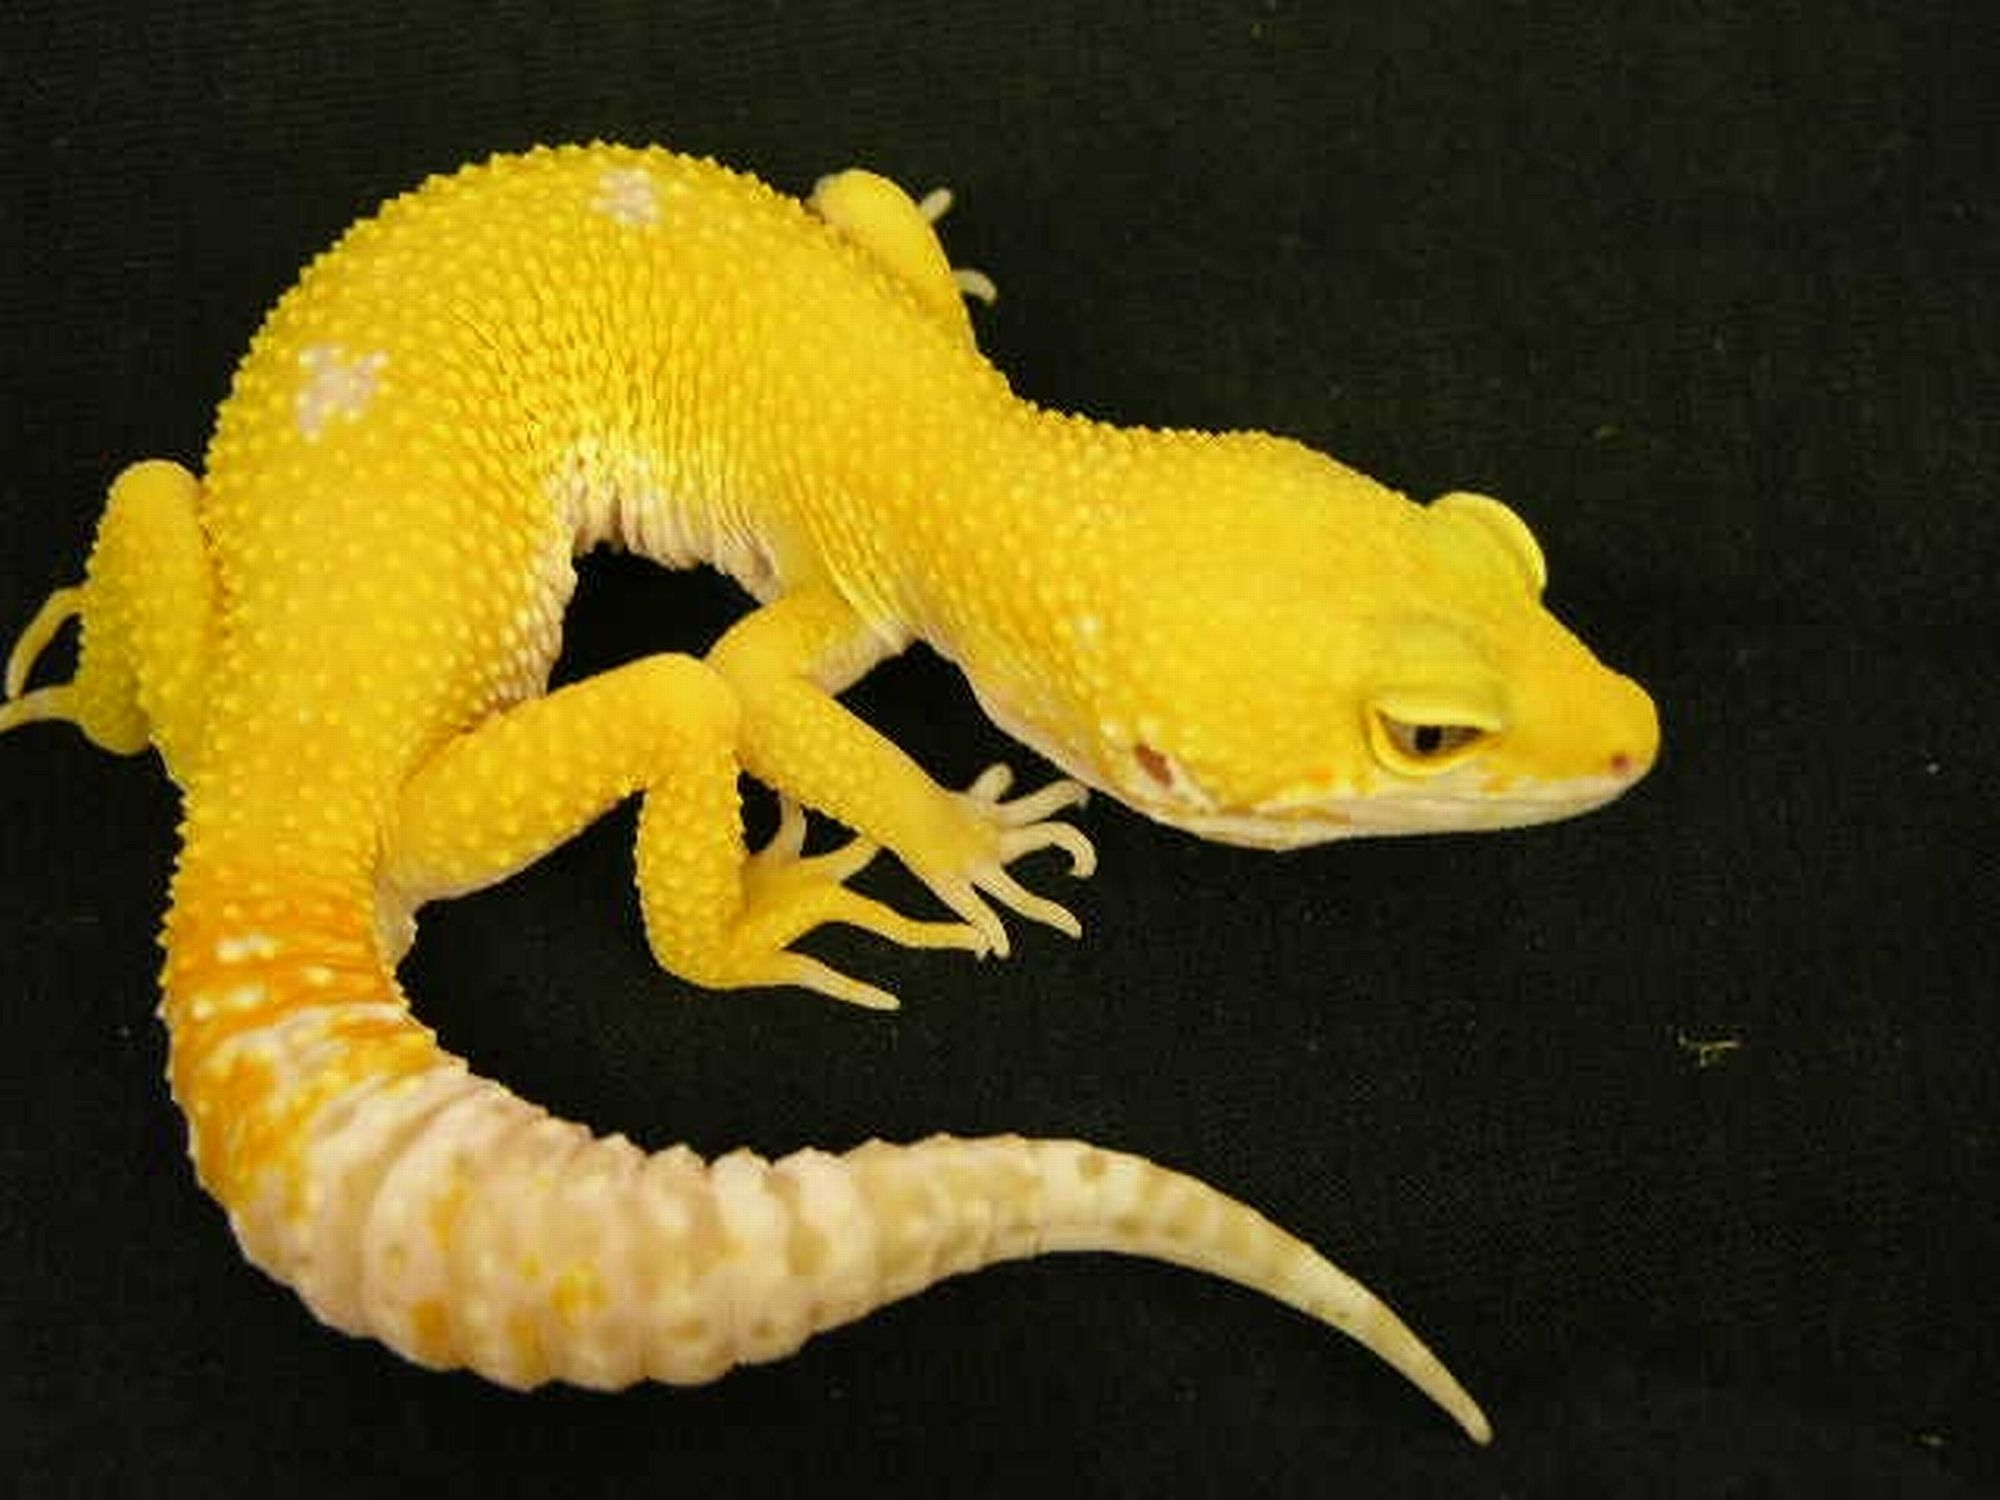 Leopard gecko. | Reptiles | Pinterest | Reptiles, Anfibios y Animales